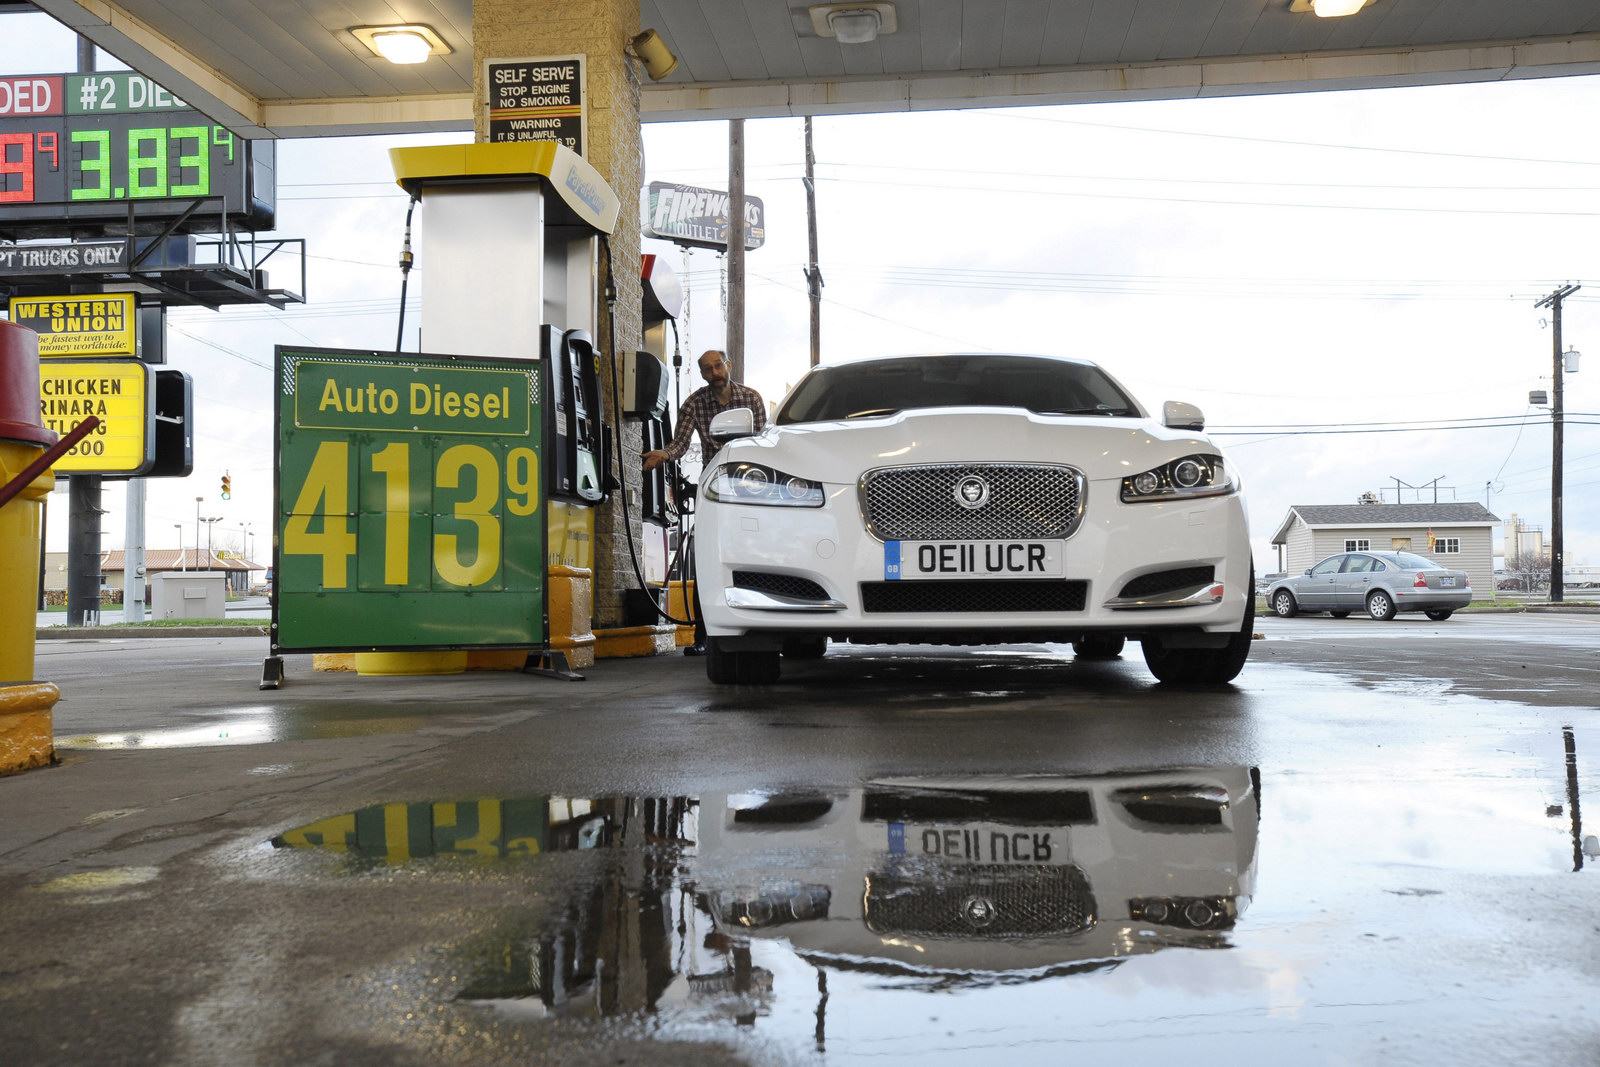 Jaguar XF 2.2 Diesel Smashes Fuel Economy Figures On US Road Trip